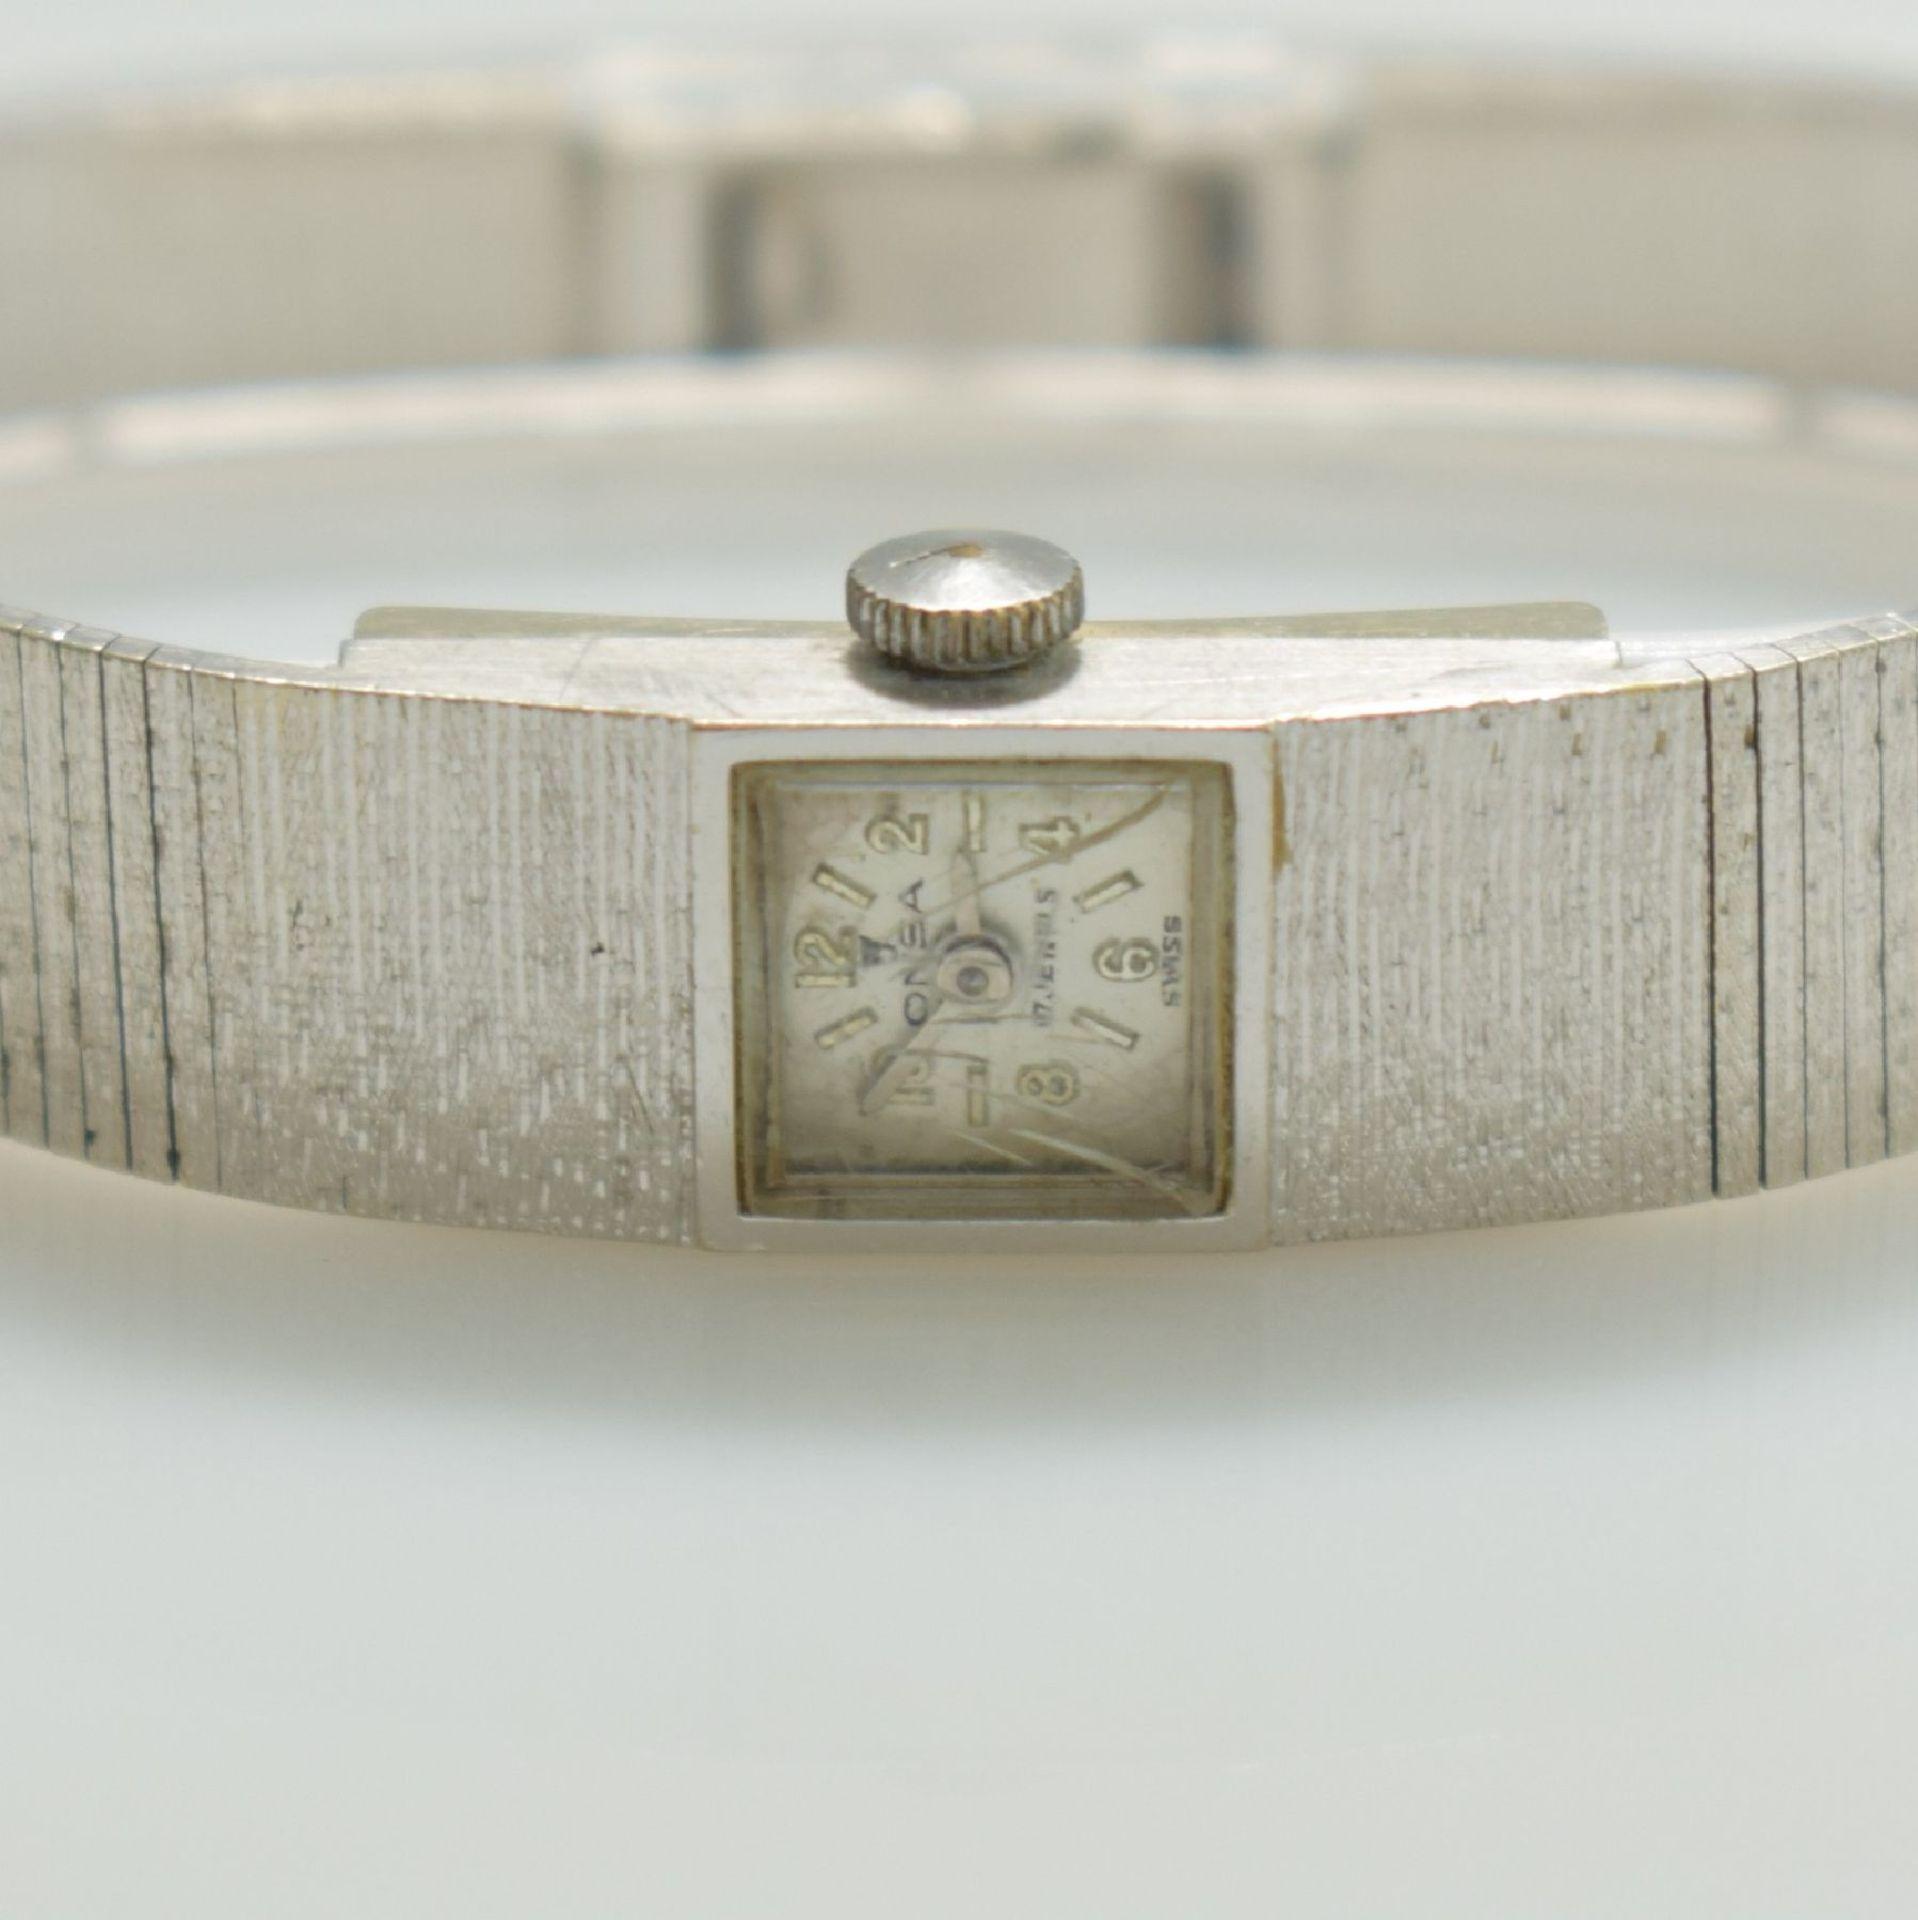 ONSA Damenarmbanduhr in WG 585/000, Schweiz um 1960, Handaufzug, Boden gedr., Band in WG 585/000, - Bild 2 aus 6